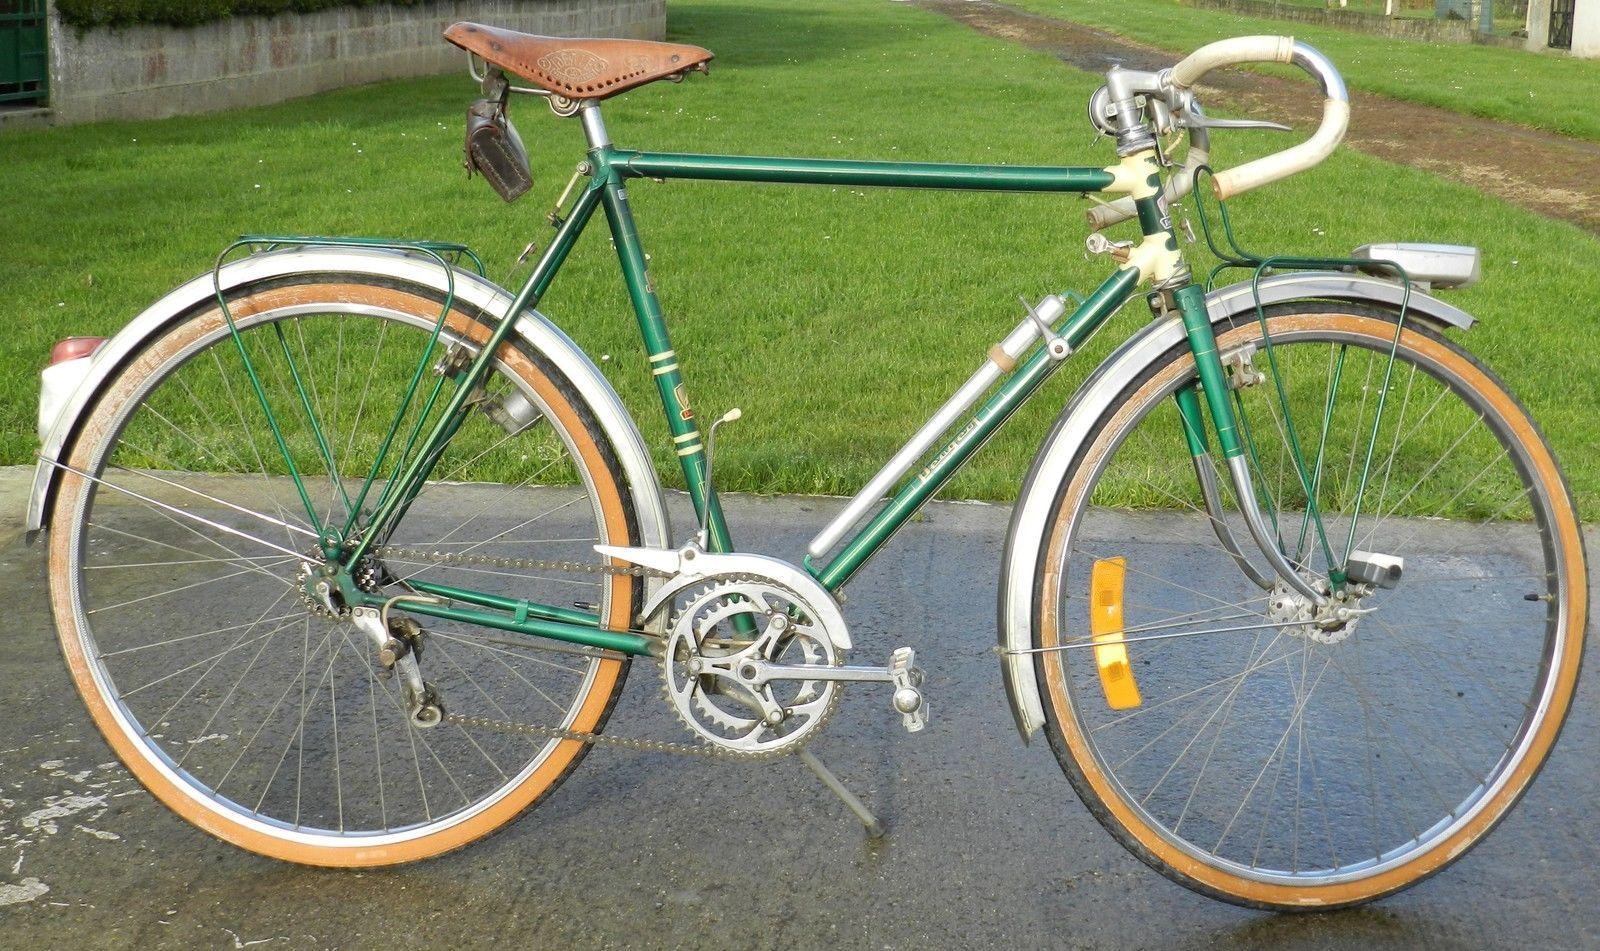 Vintage Bike Peugeot Inoxydable Tube Special Allege Peugeot Juy Simplex Size 55 Ebay Fiets